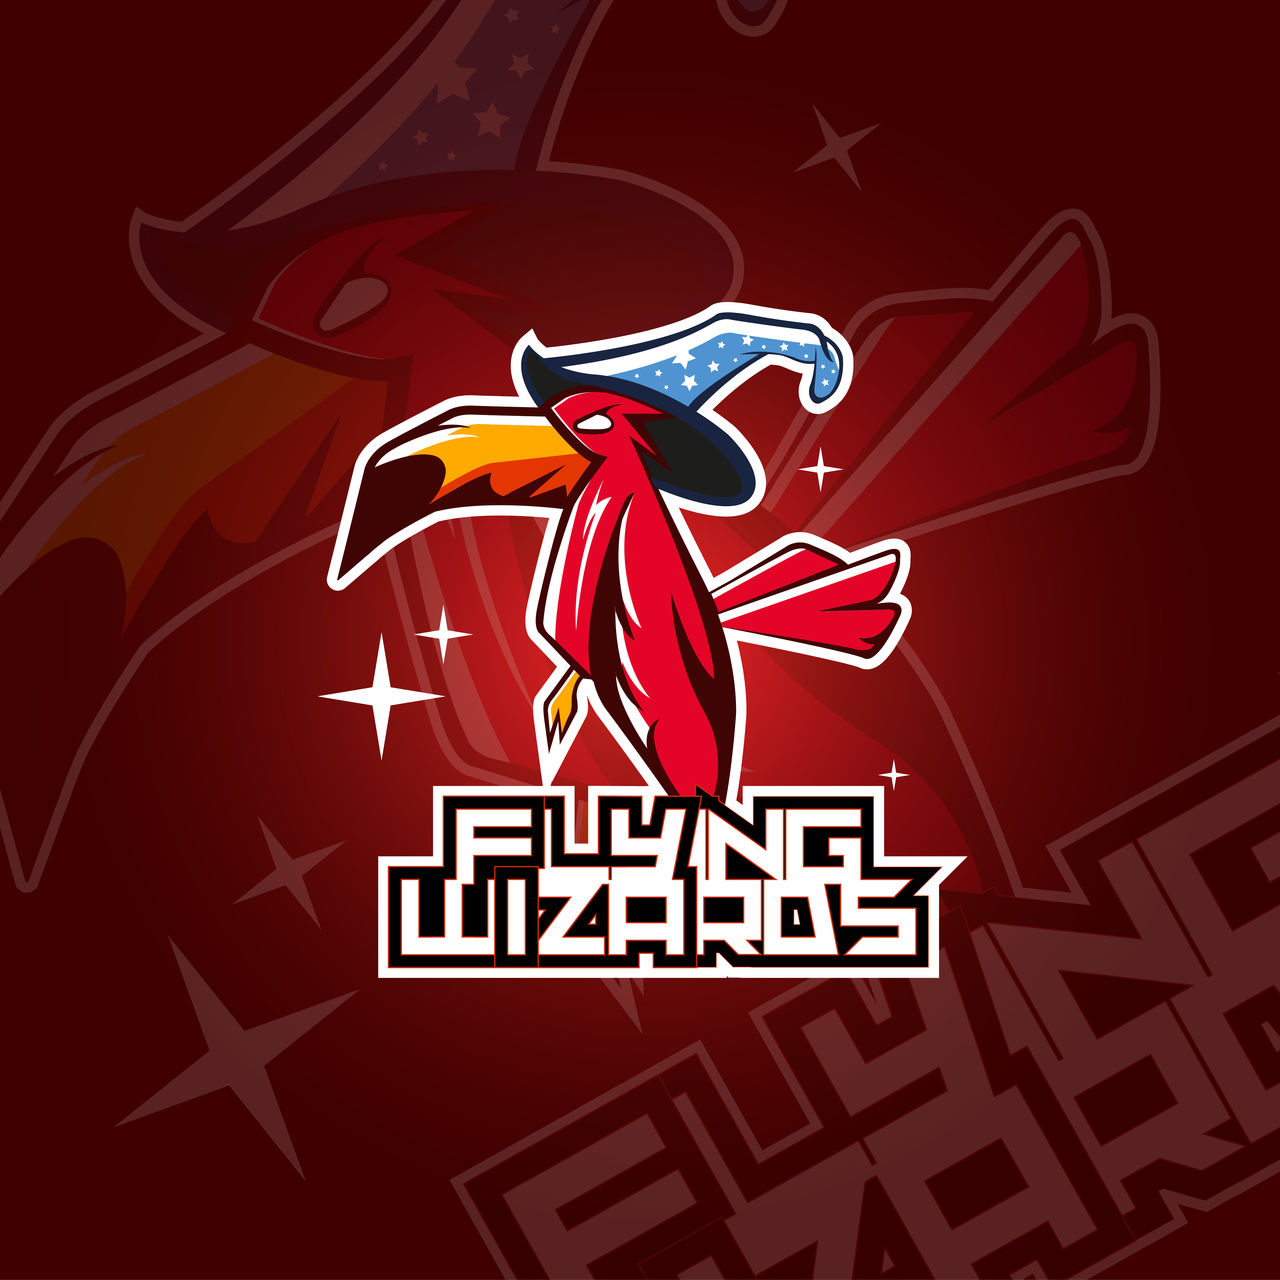 Logo Flying Wizards